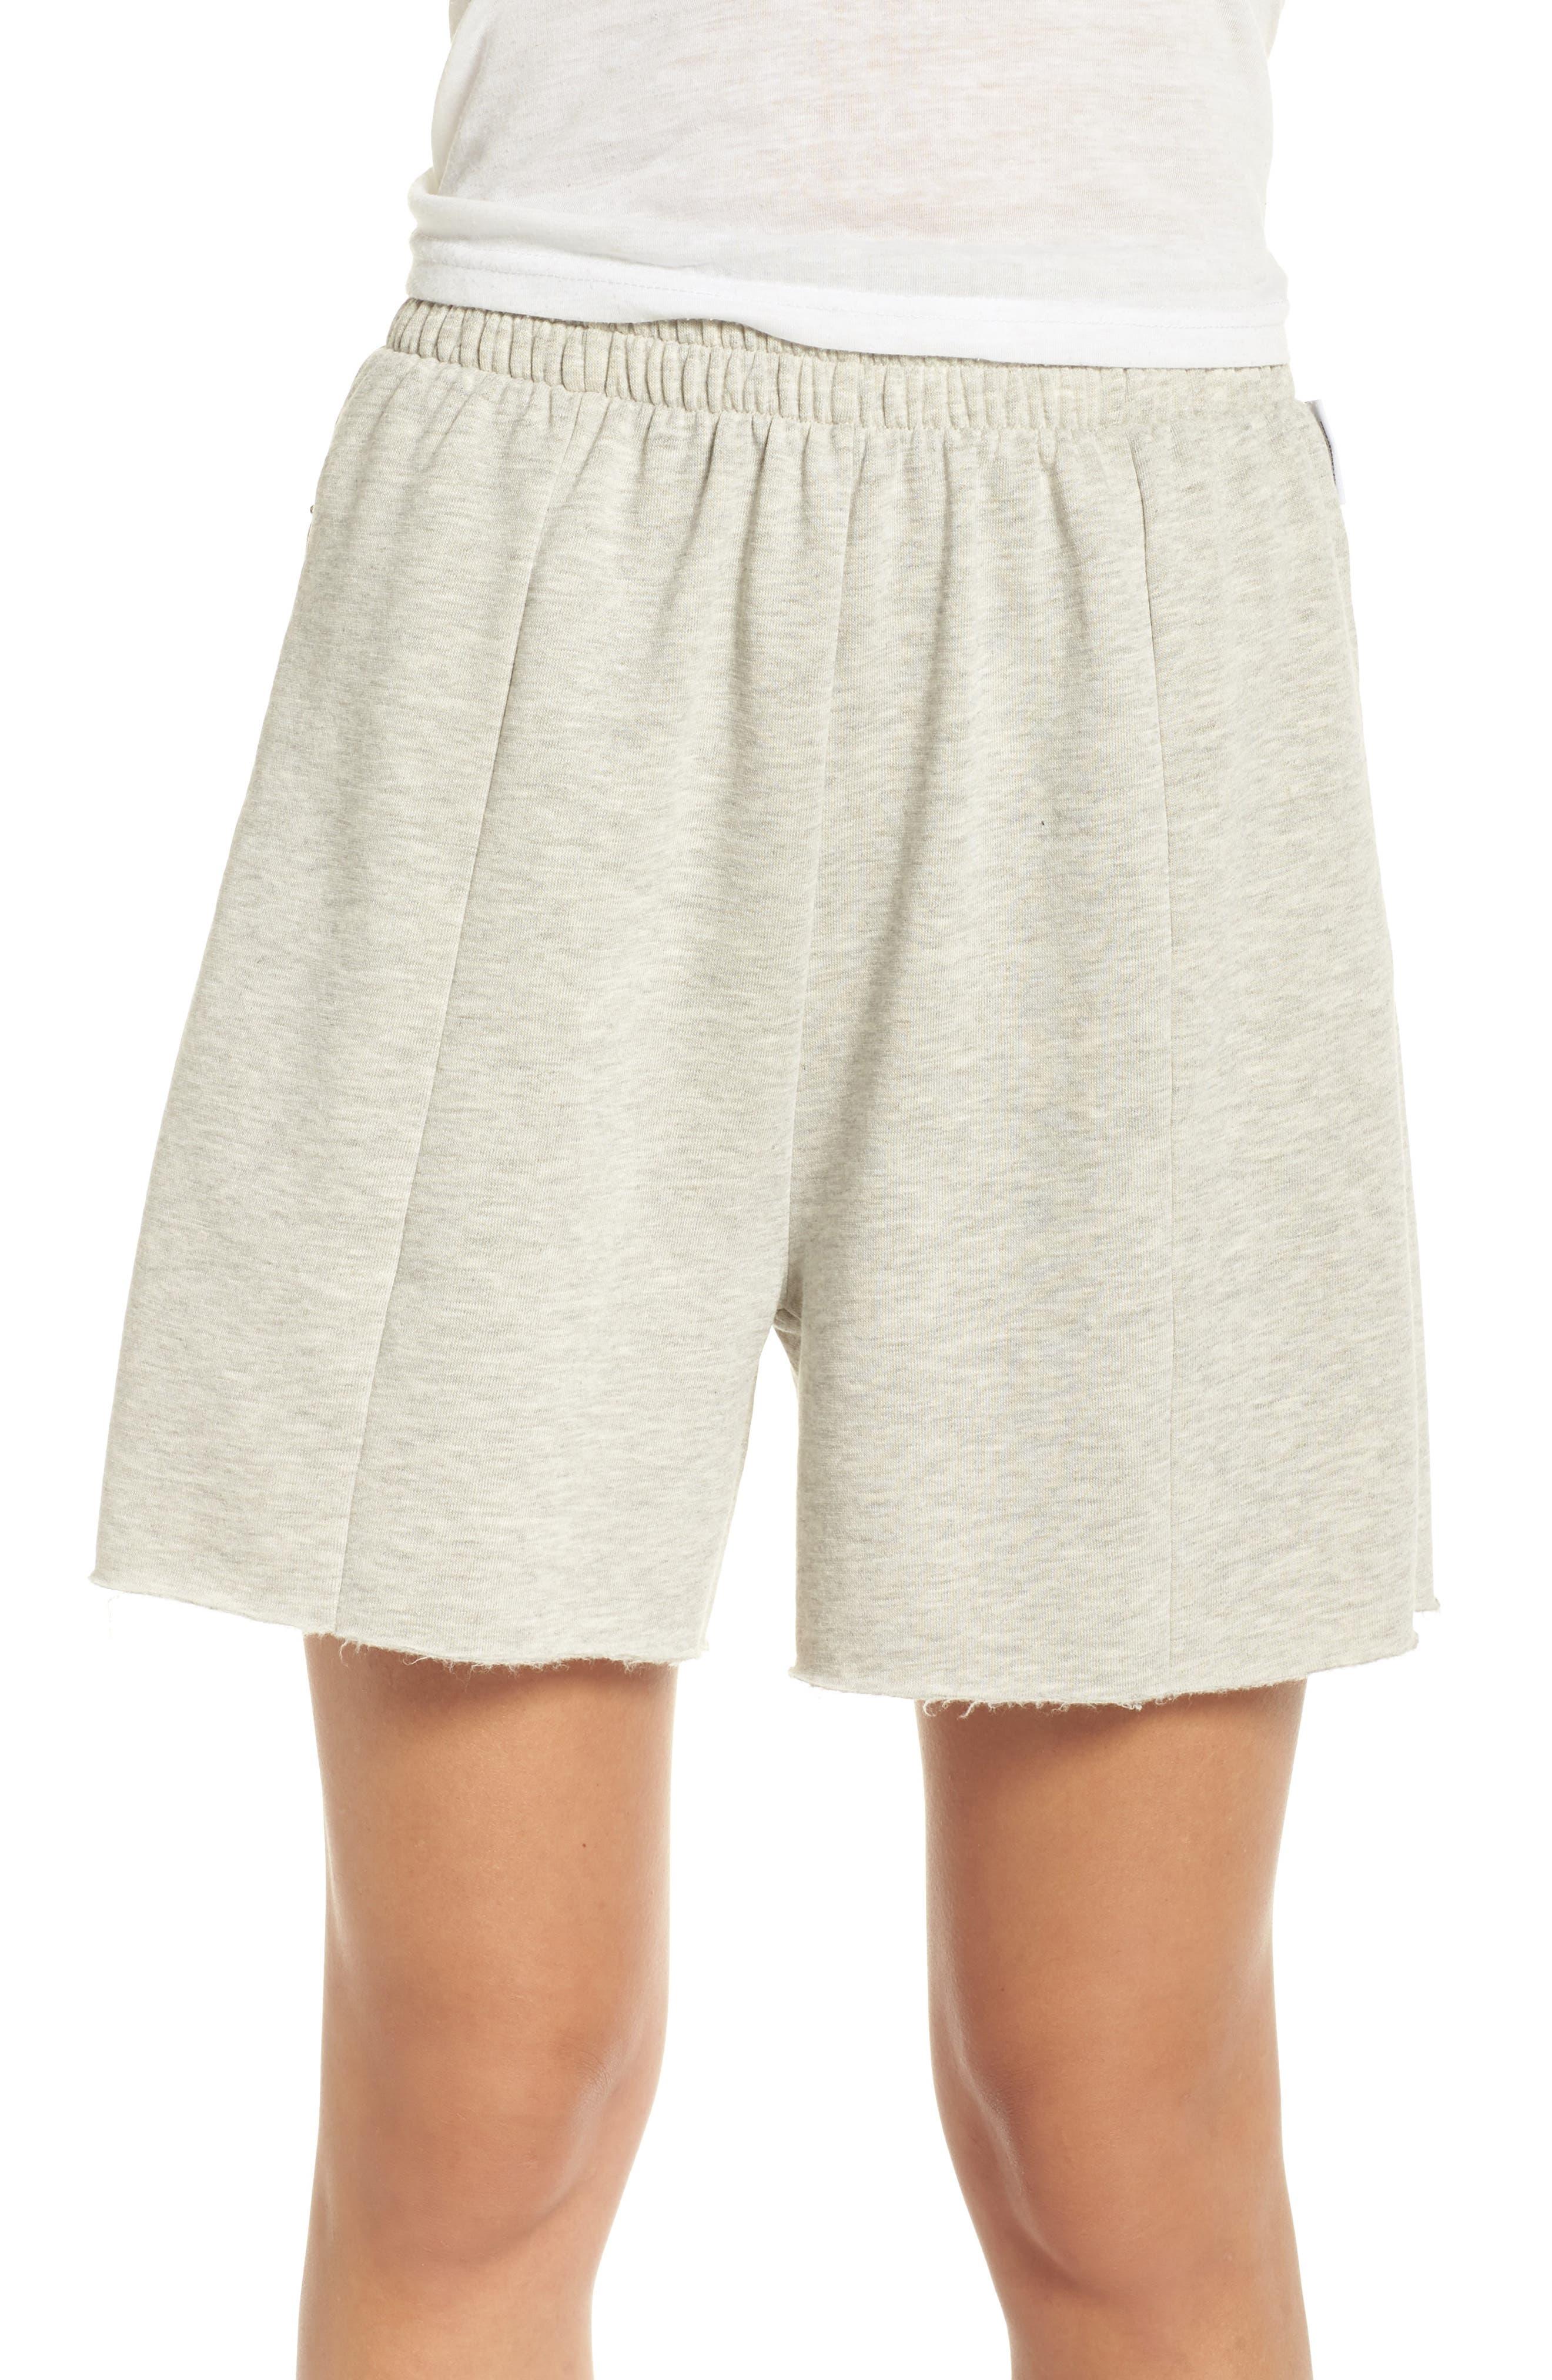 Bermuda Lounge Shorts,                         Main,                         color, PEBBLE HEATHER